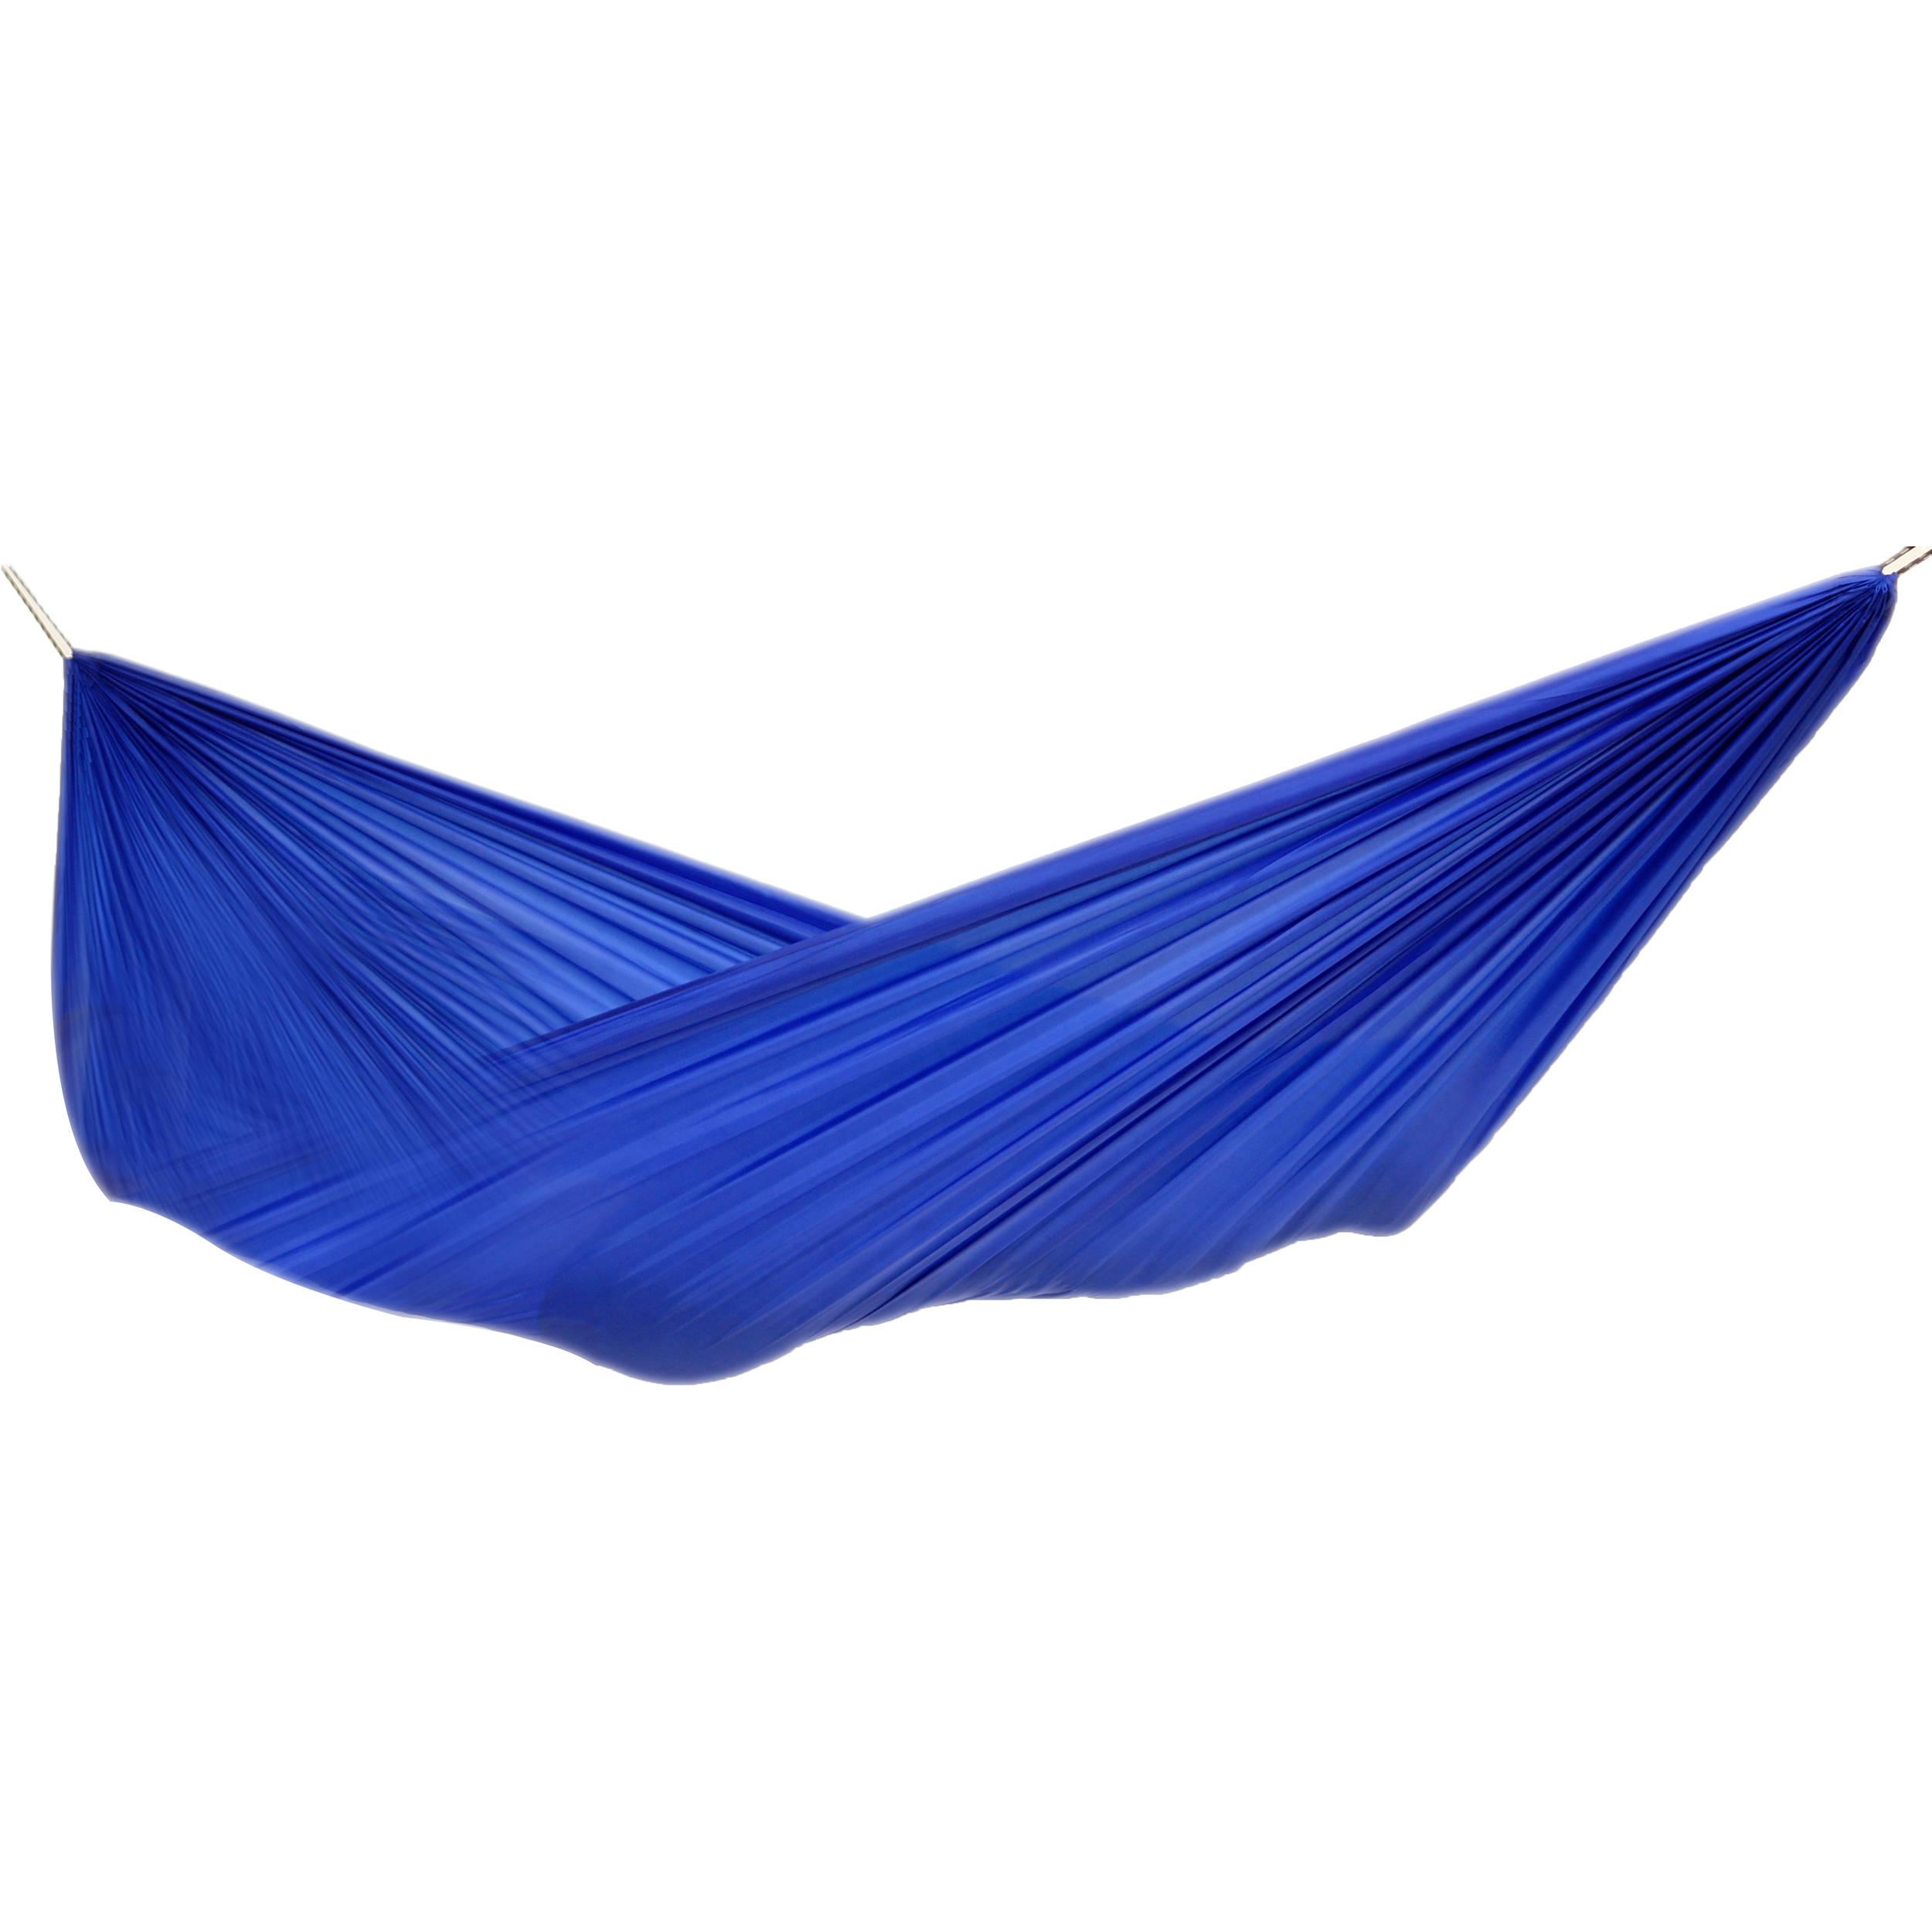 byer of maine traveller lite hammock  blue sky  byer of maine traveller lite hammock  blue sky  a103020 b u0026h  rh   bhphotovideo